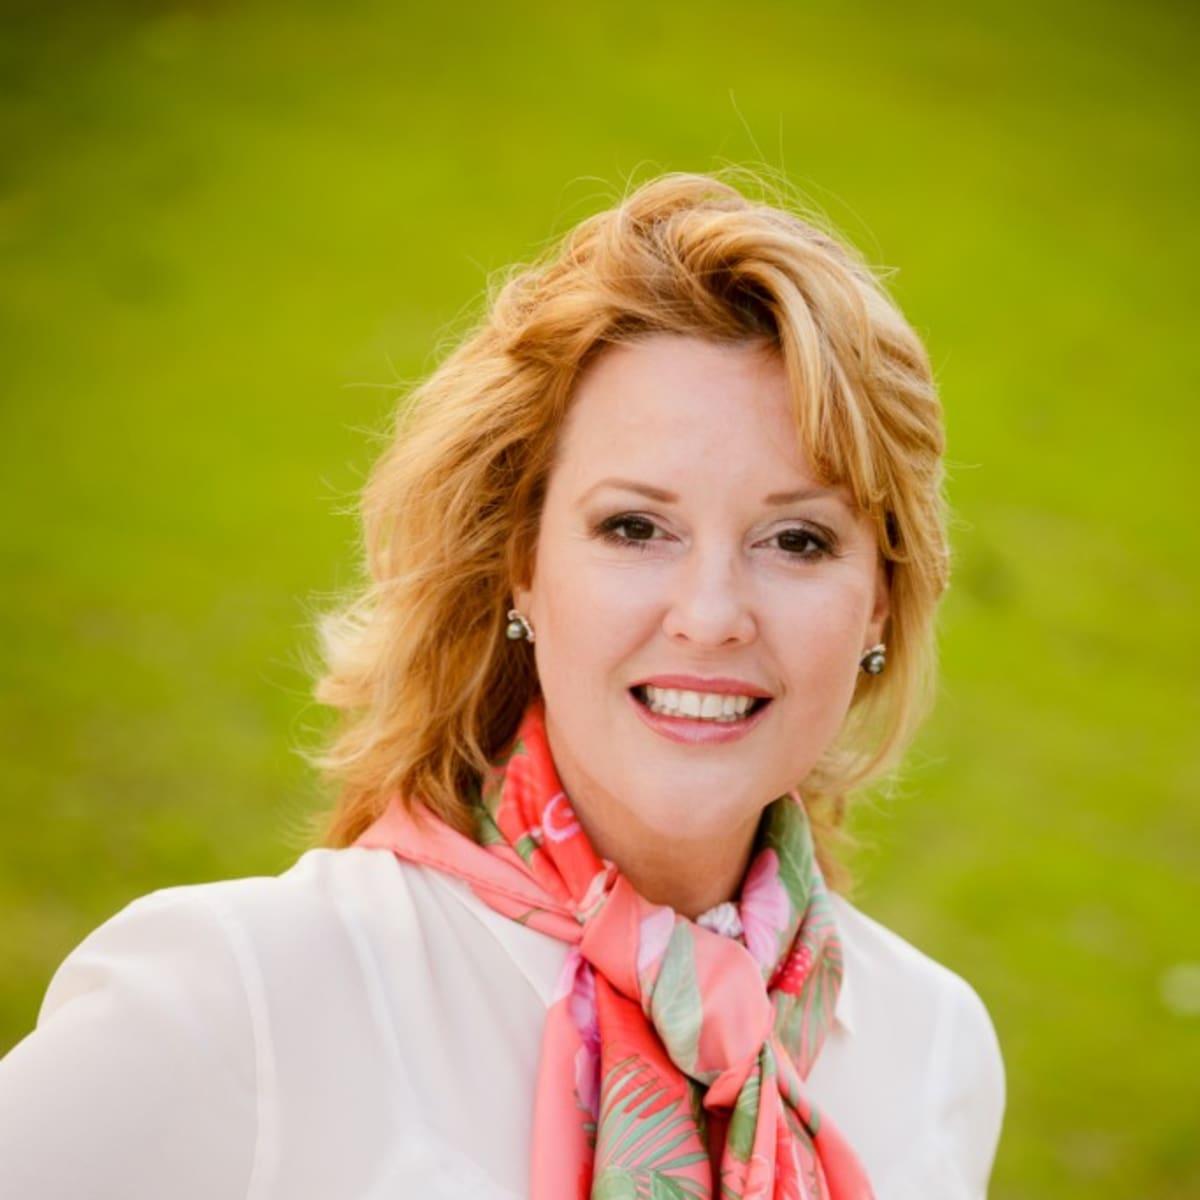 Dr Juliet Burry Md Altamonte Springs Fl Pain